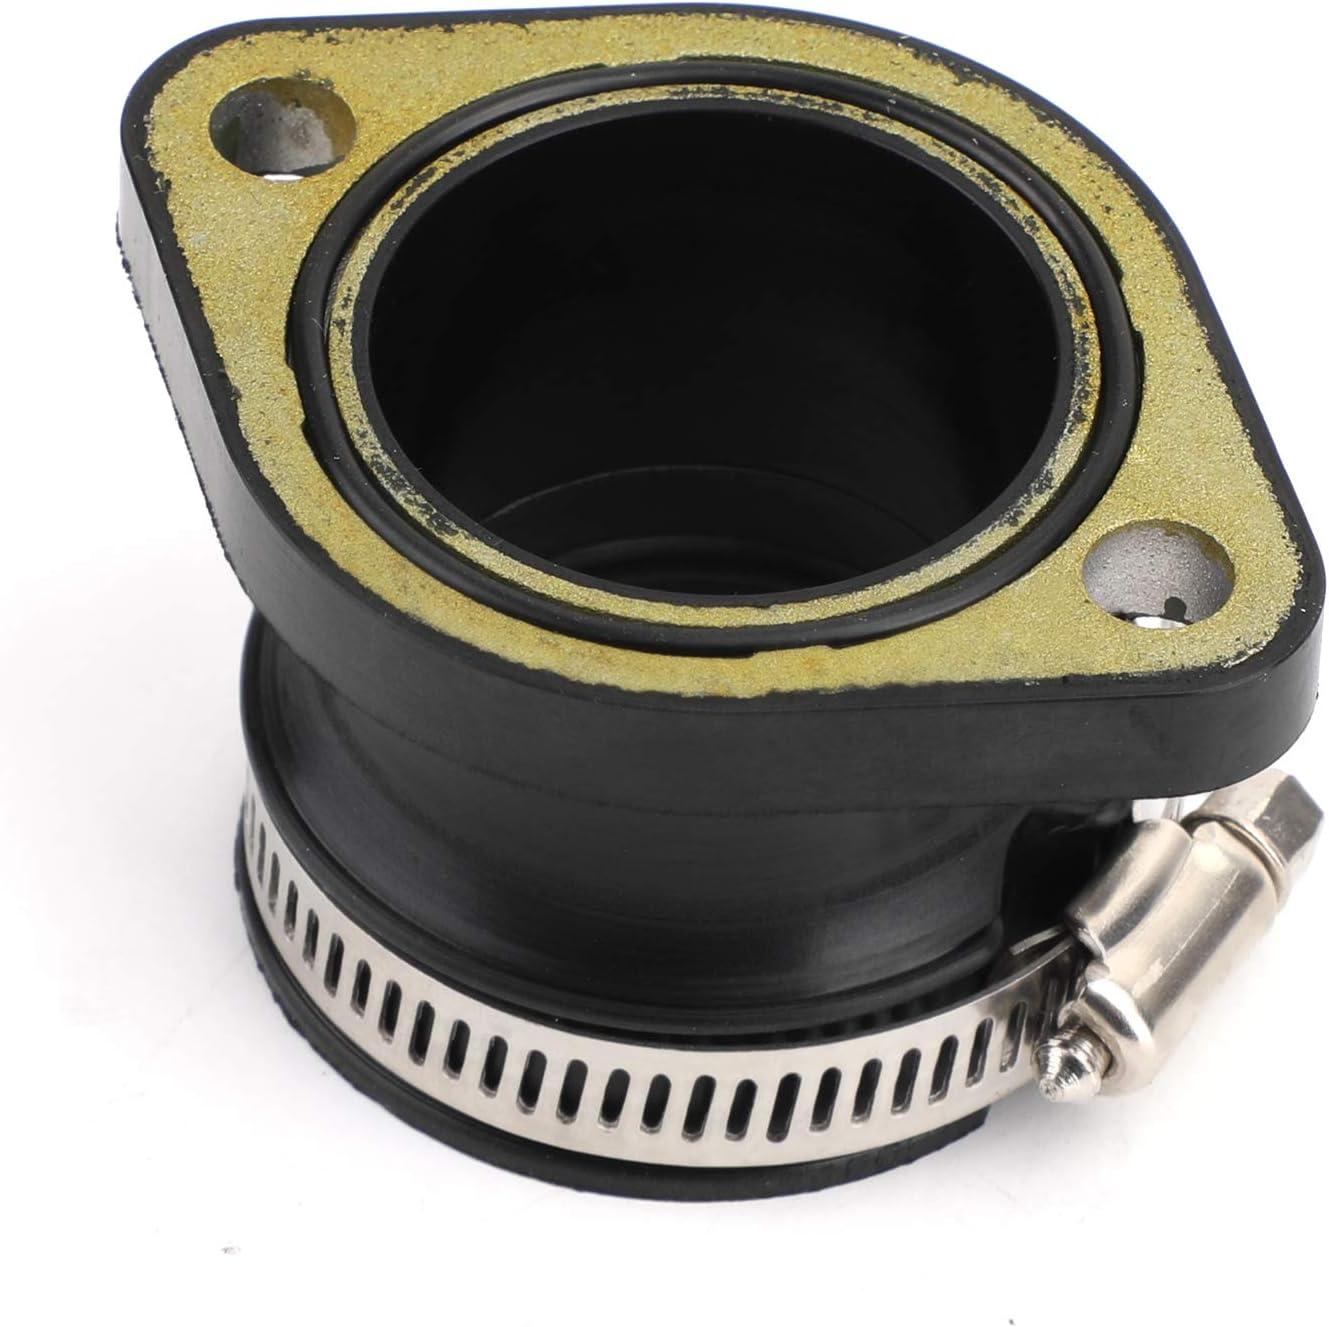 Topteng New Intake Manifold Boot Joint Carburetor Carb Flange Socket For Polaris 3085044 3083306 3082537 3082439